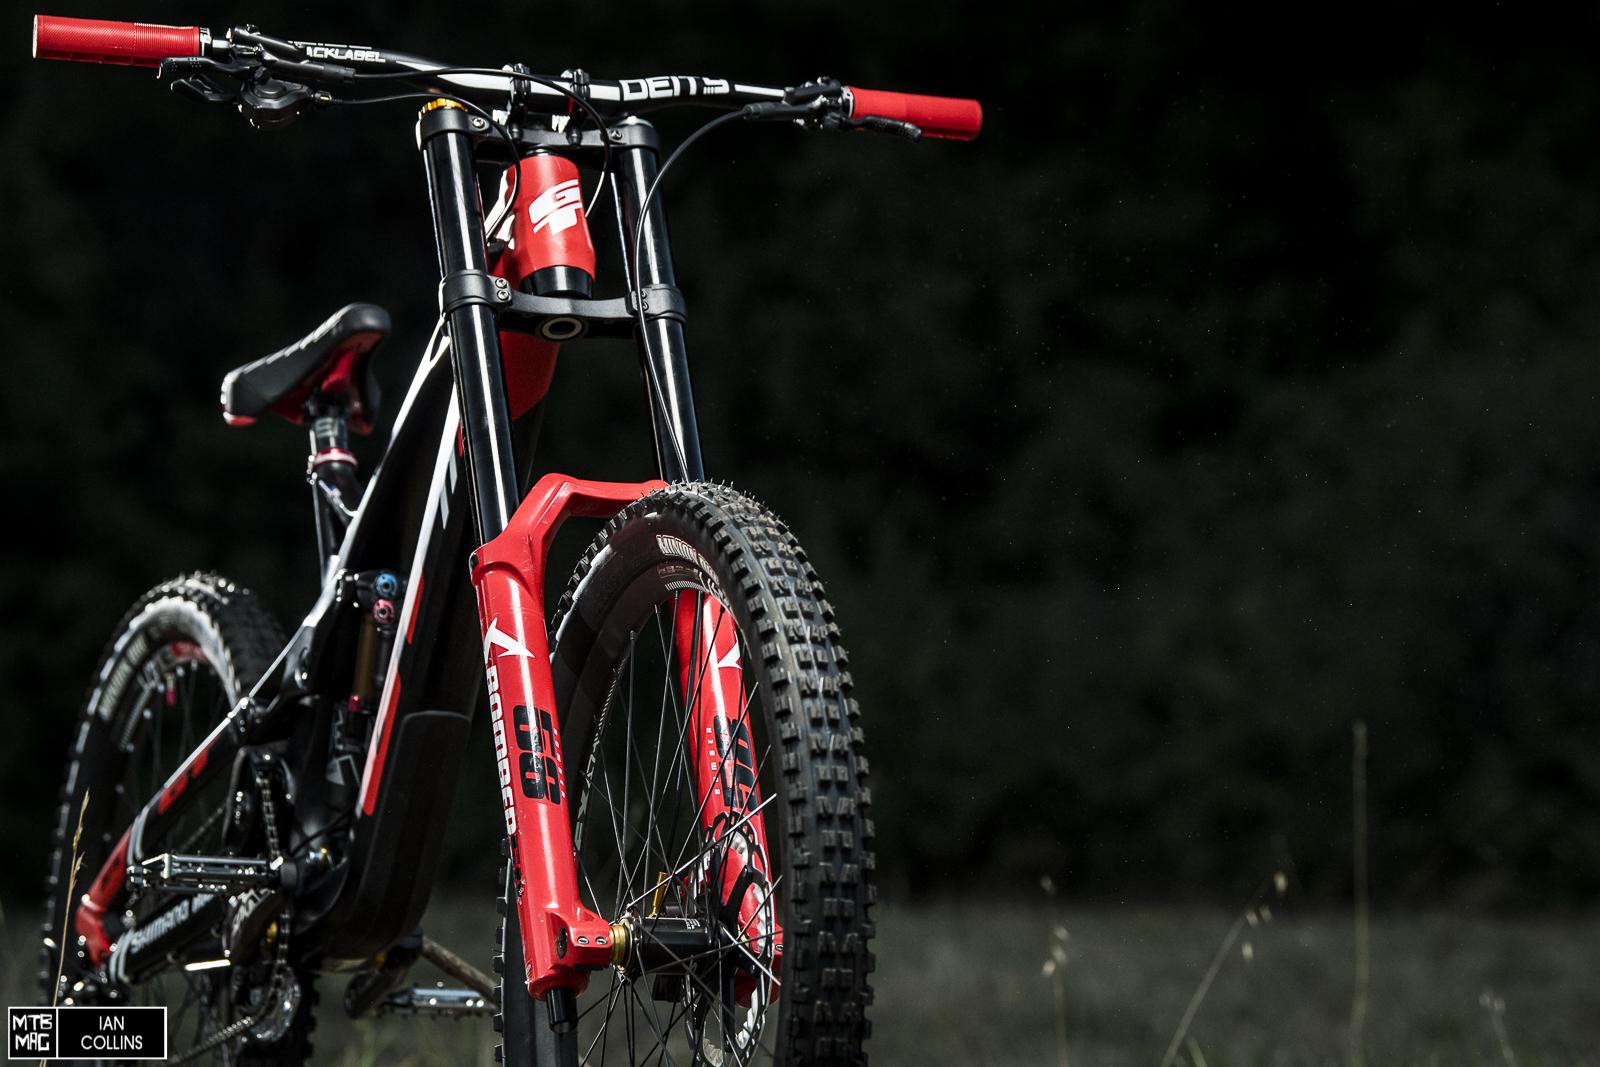 MTB-MAG COM - Mountain Bike Magazine | [Bike Check] Tyler